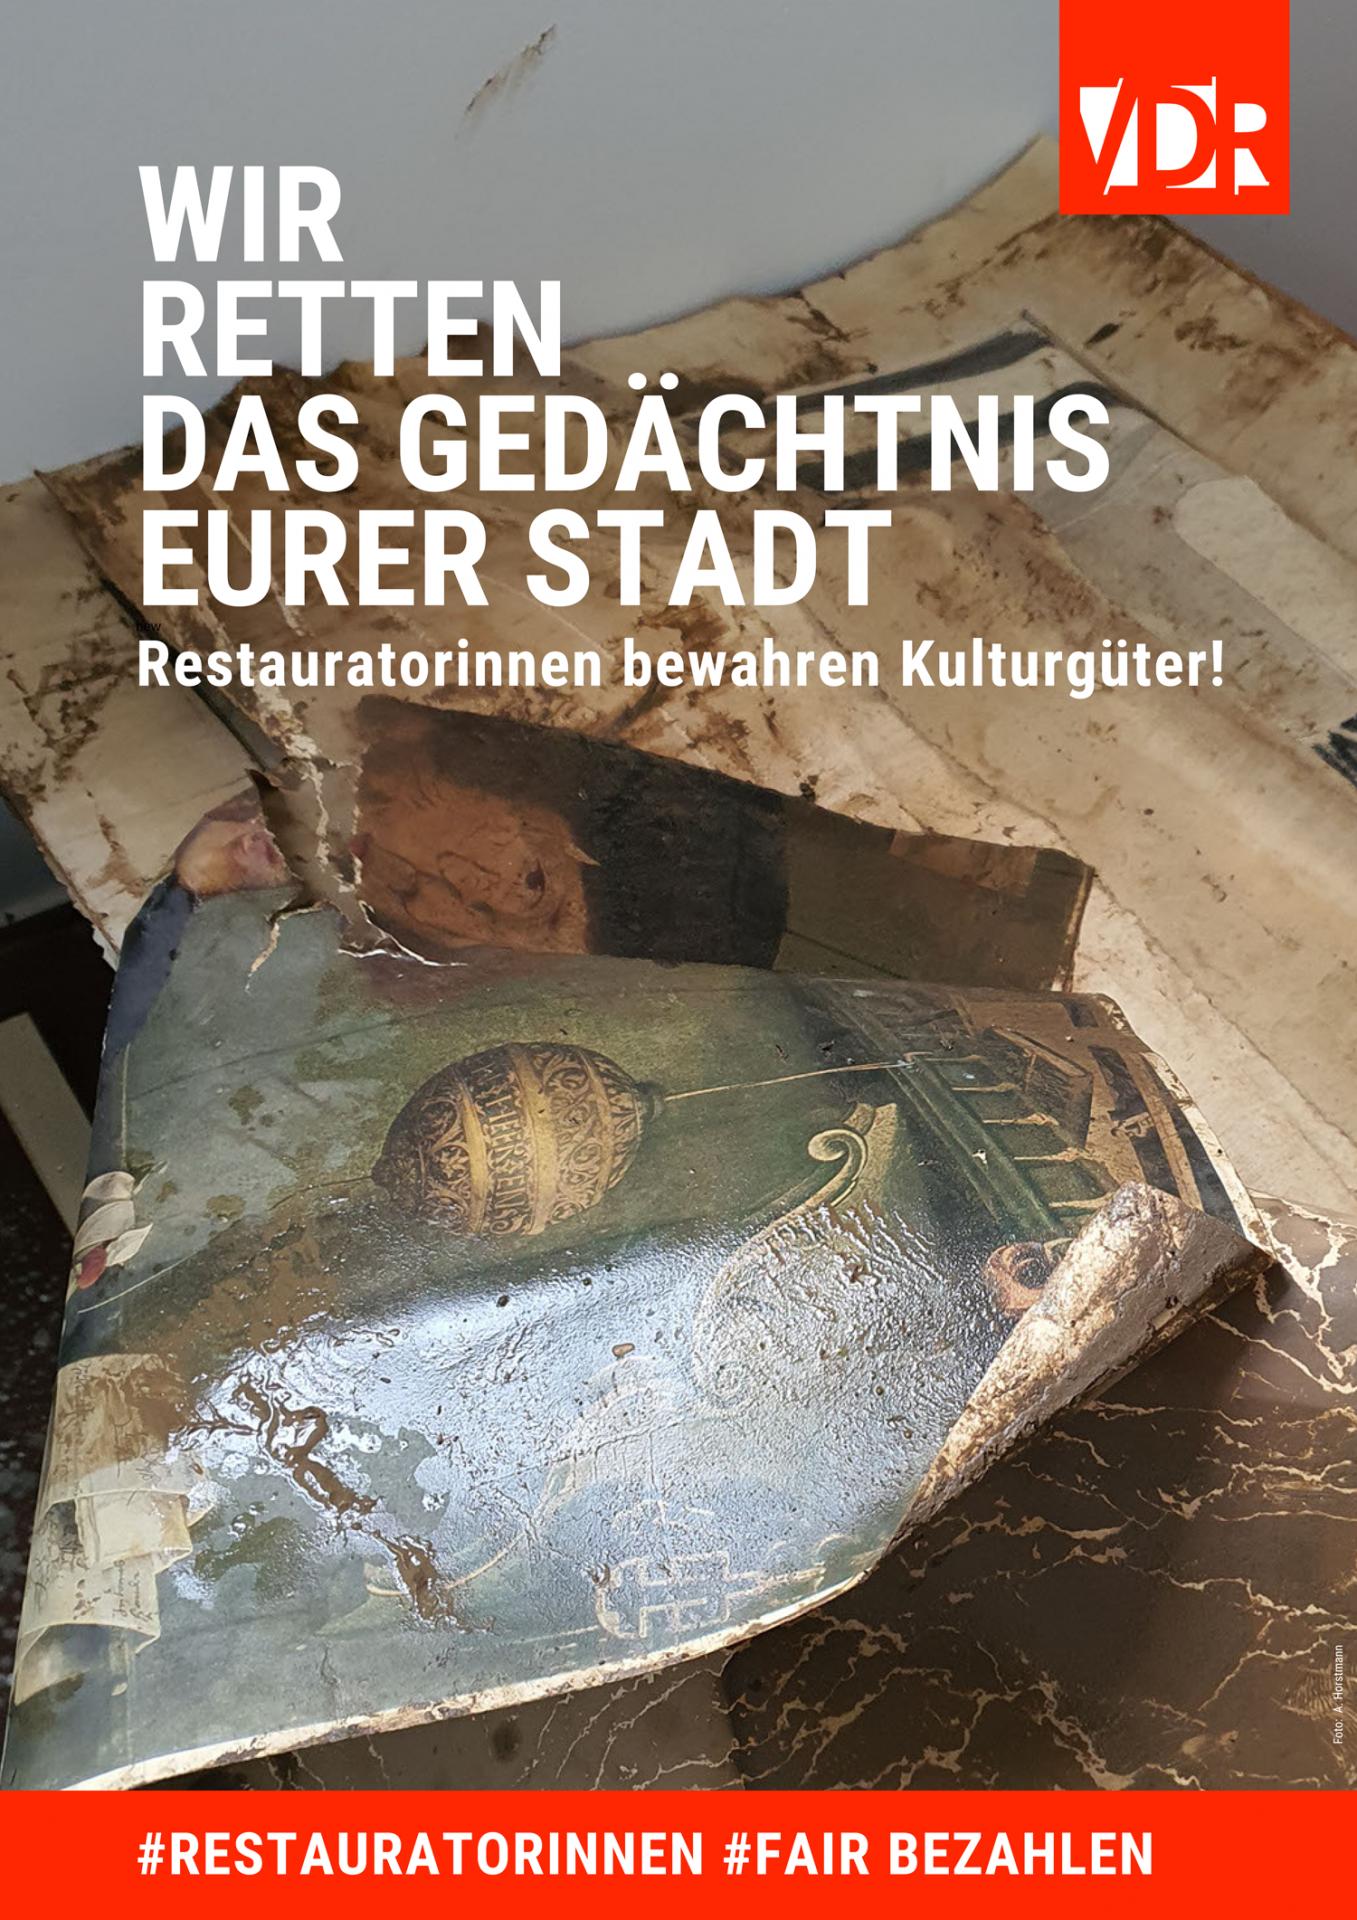 2021-08-31_Poster_04_VDR-Tarifkampagne_w_web